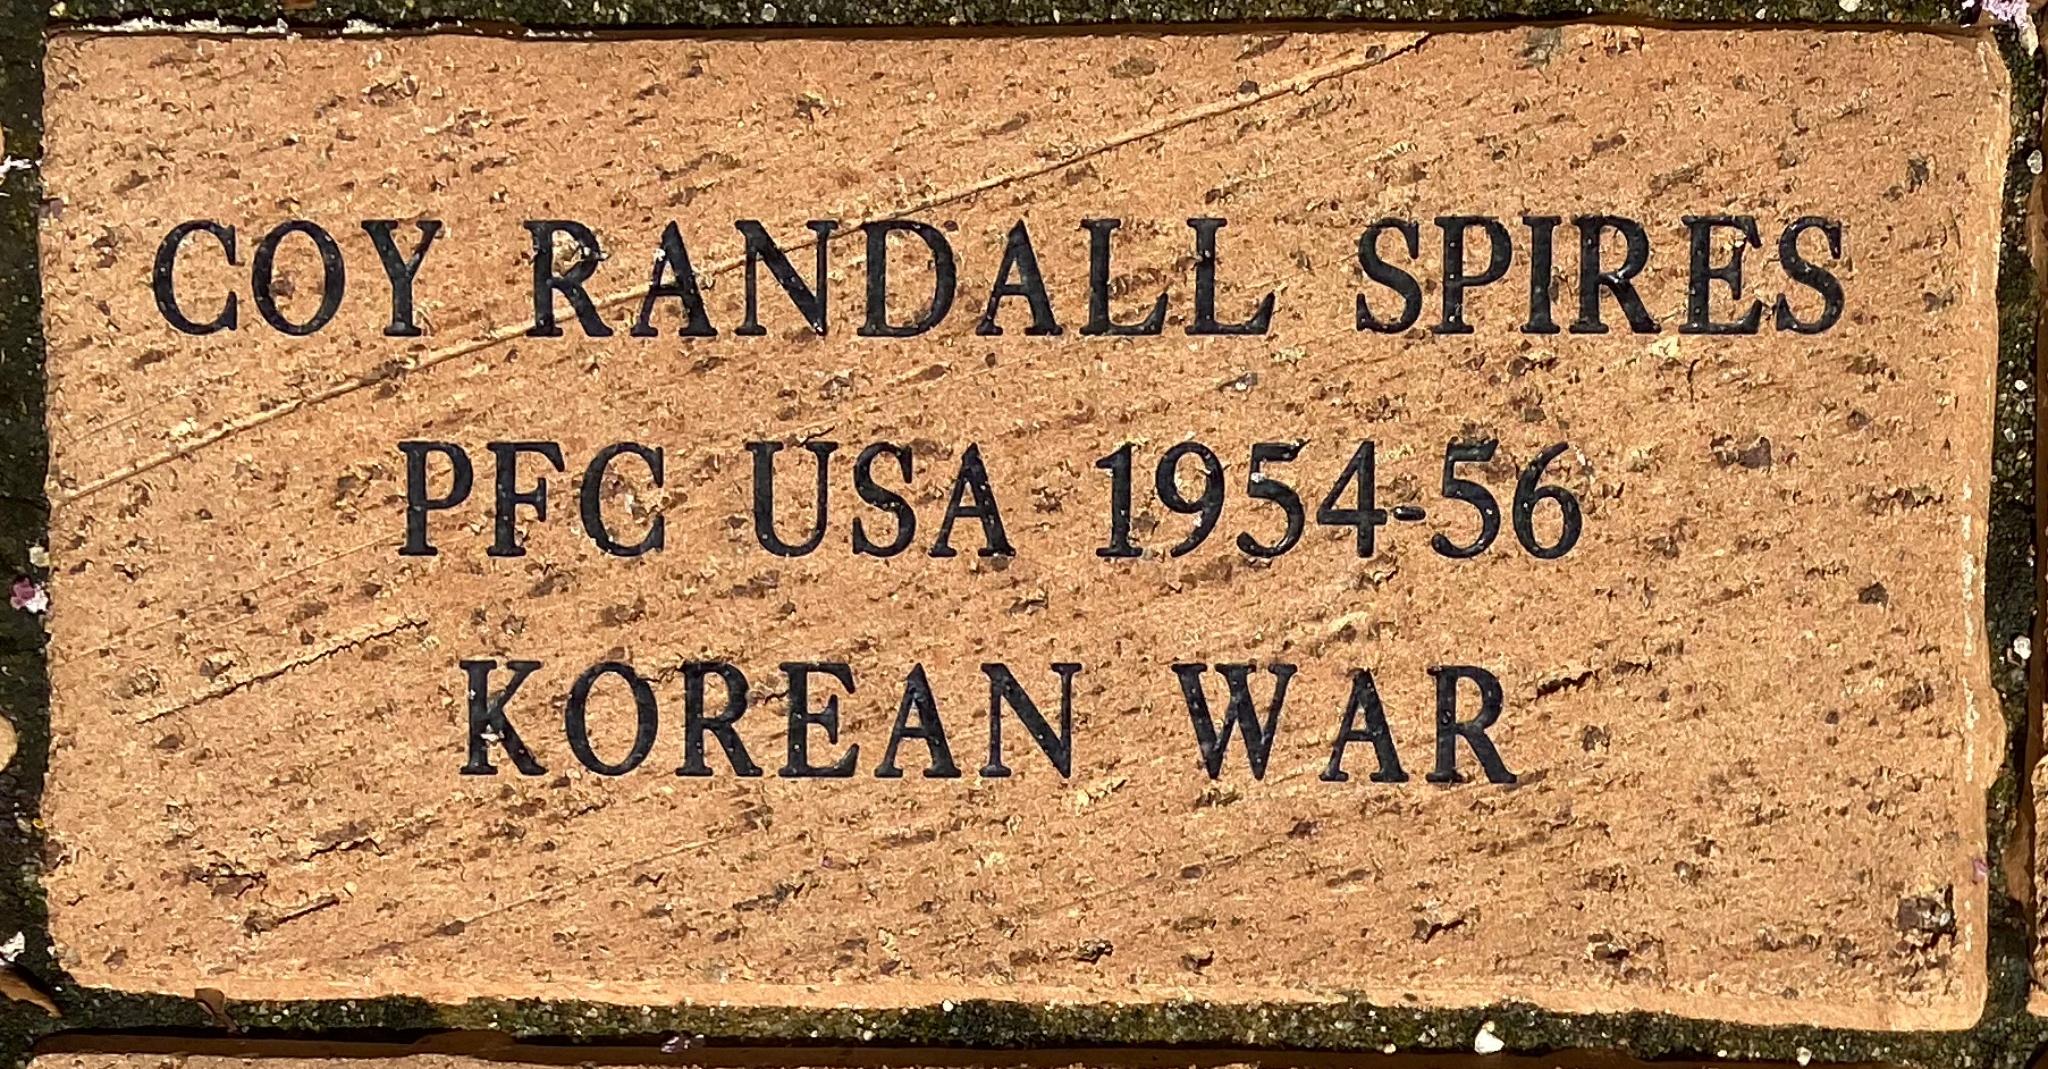 COY RANDALL SPIRES PFC USA 1954-56 KOREAN WAR